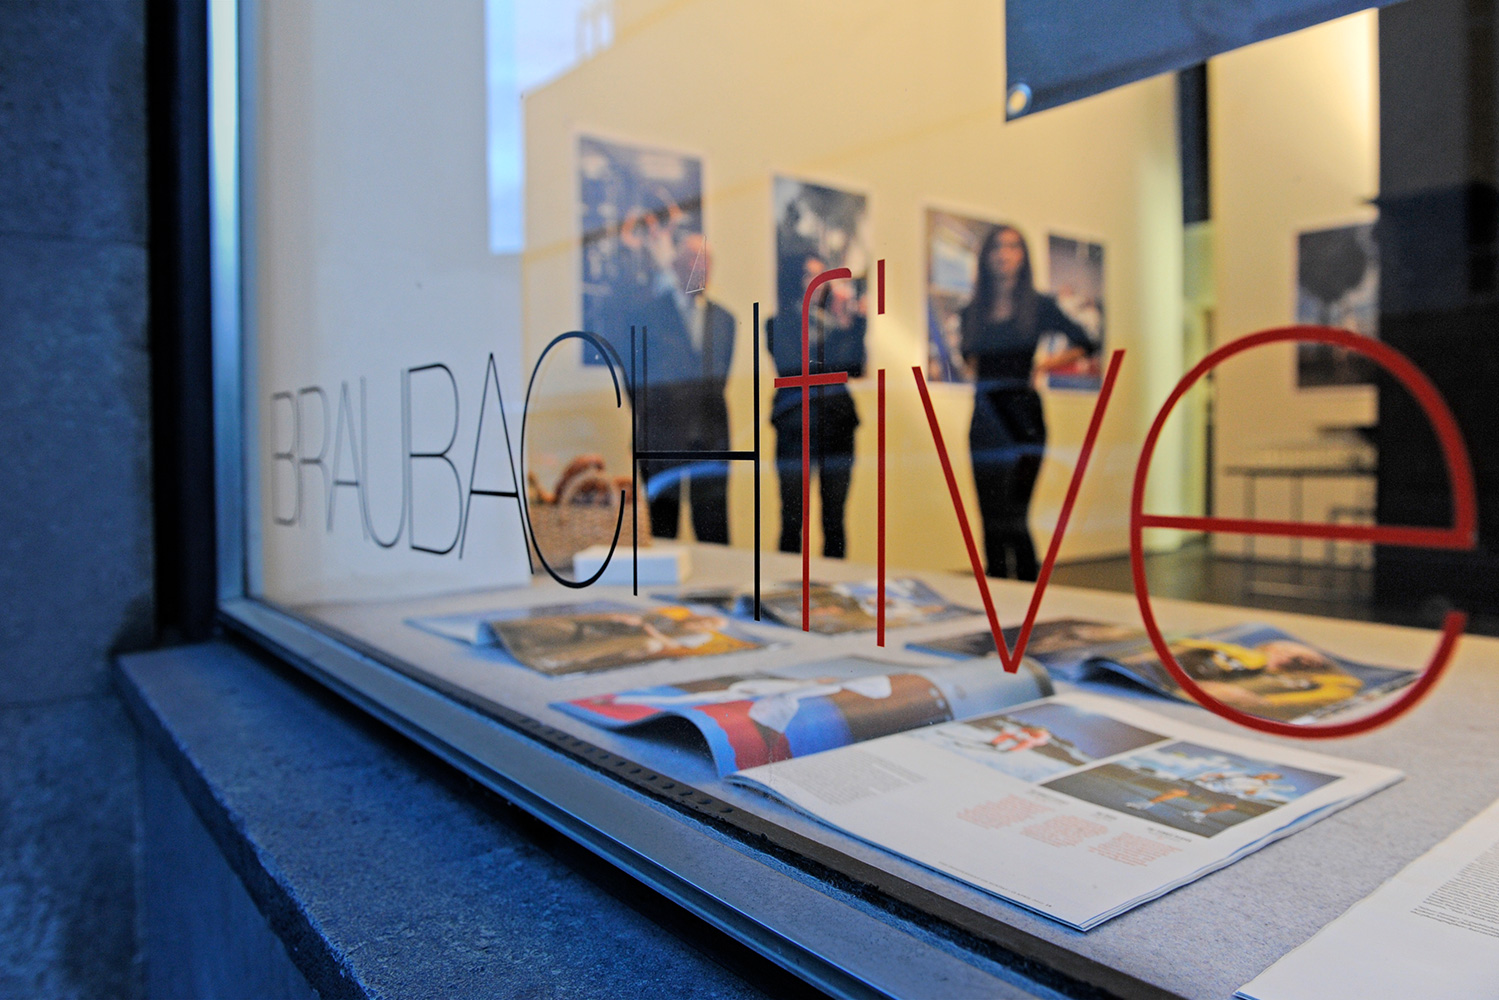 Galerie Braubachfive, Frankfurt am Main, 2012